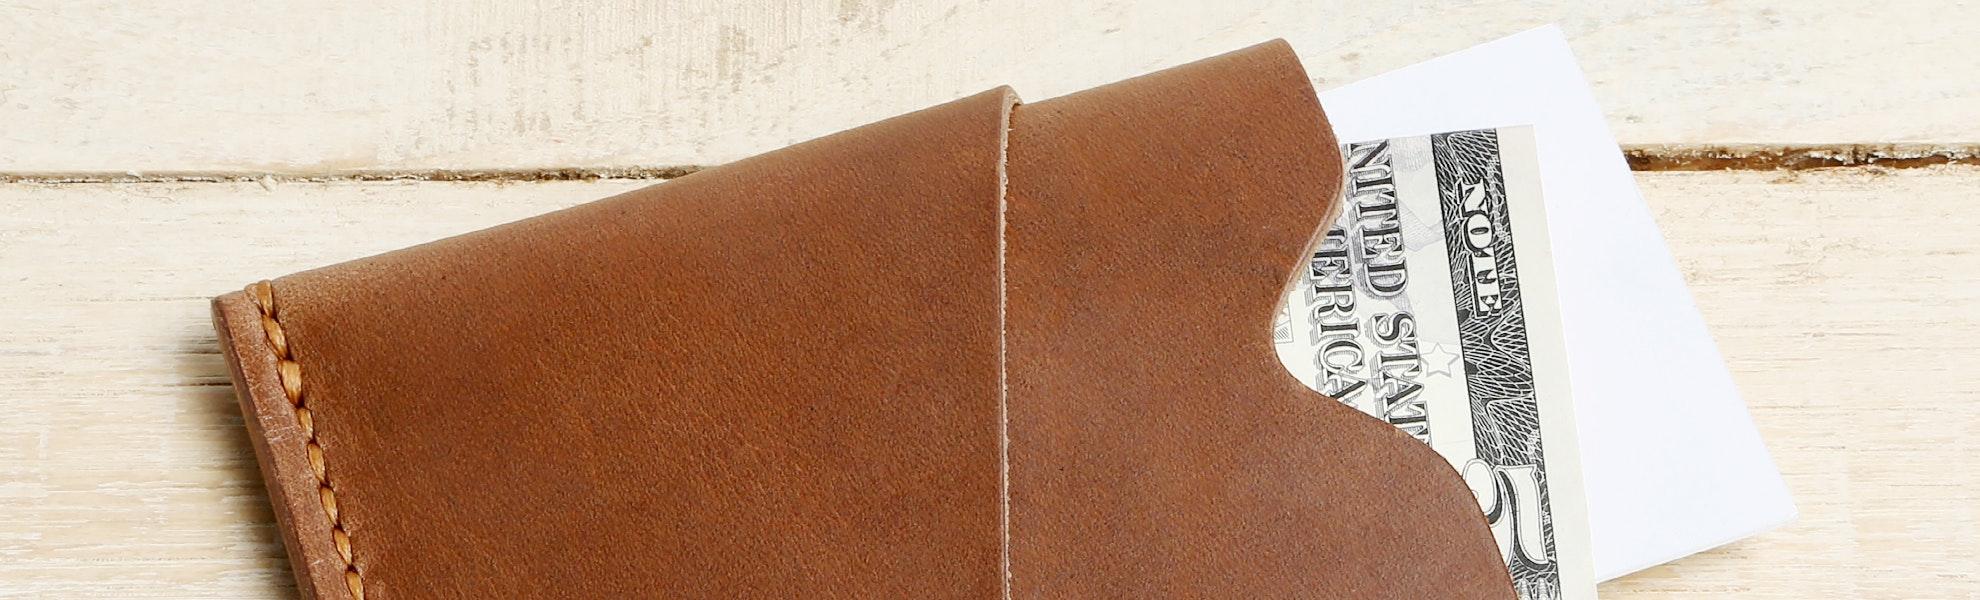 Popov Leather Driftwood Chromexcel Card Holder